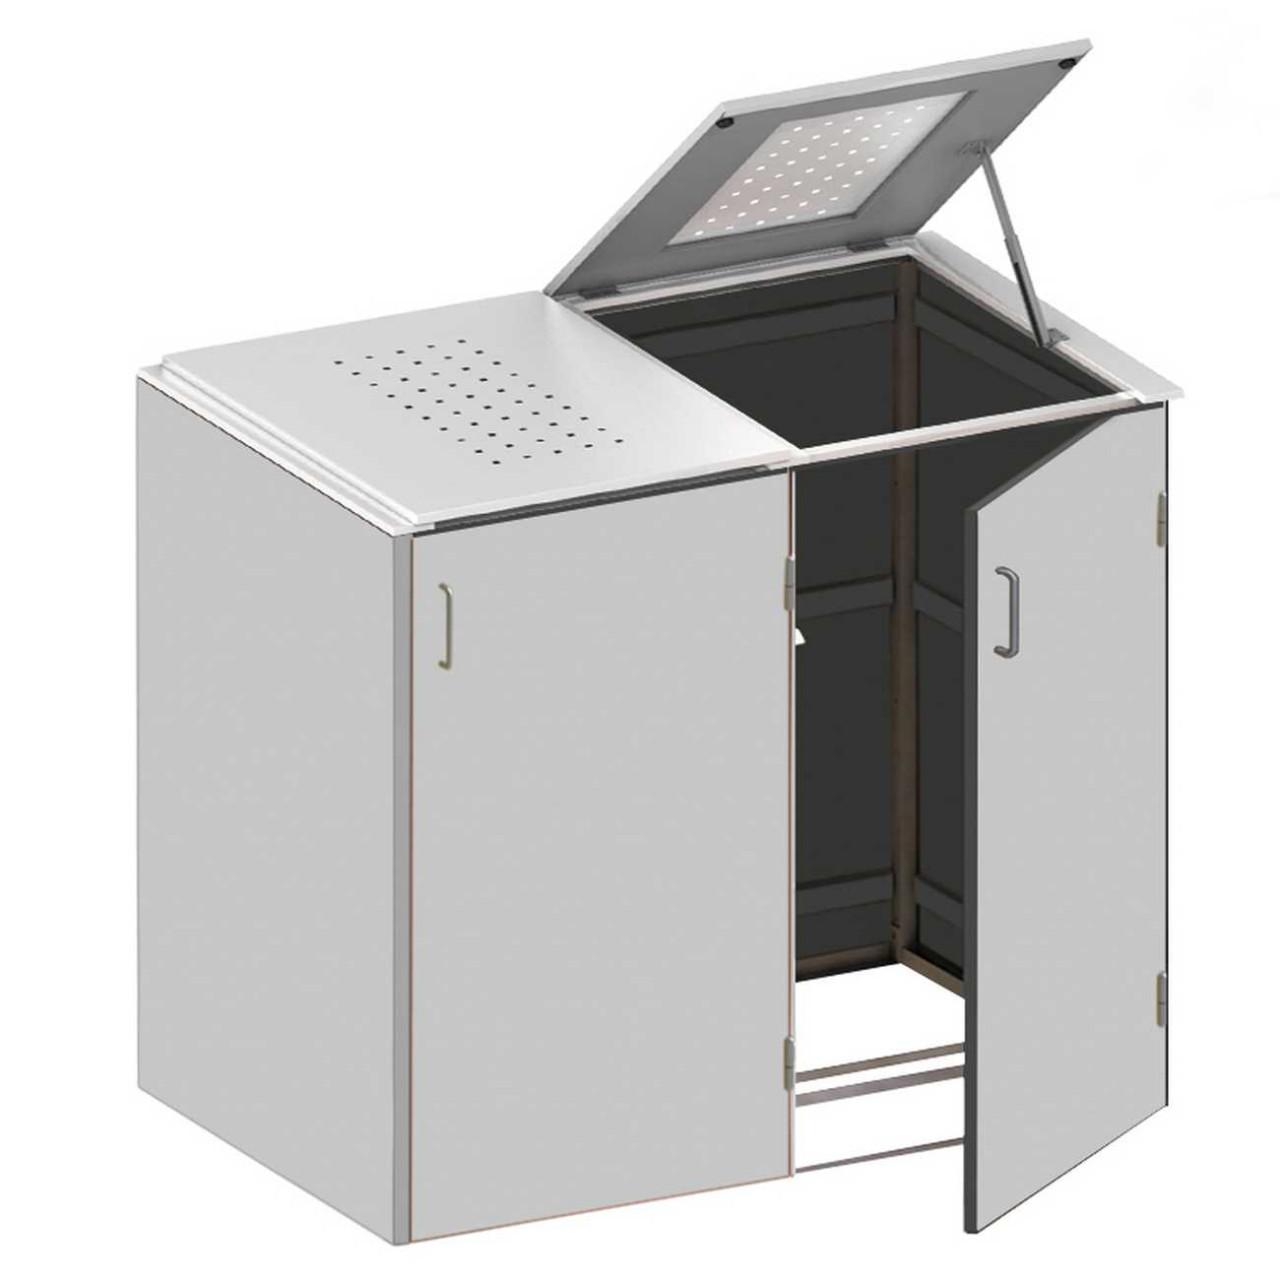 Binto Müllbox HPL Grau mit Edelstahl-Klappdeckel